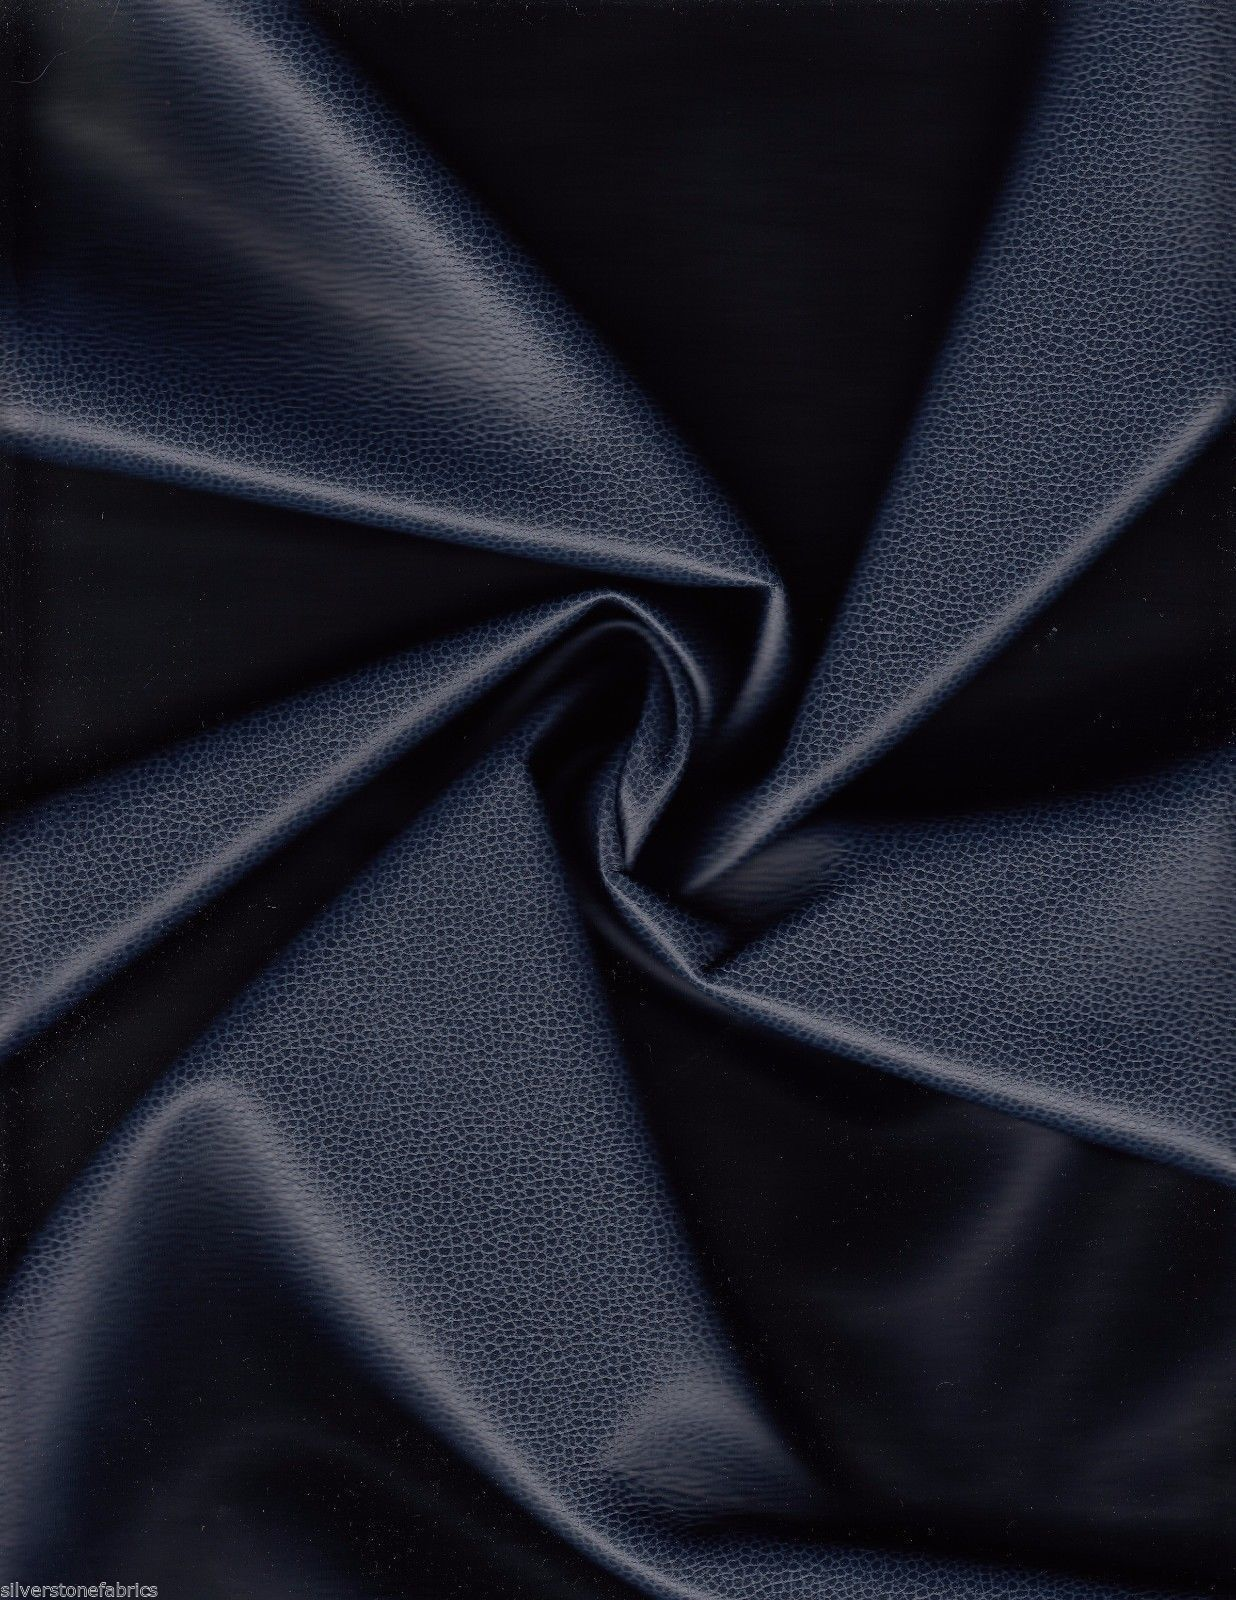 Ultrafabrics Upholstery Fabric Promessa Faux Leather Atlantic Blue 1.625 yds T16